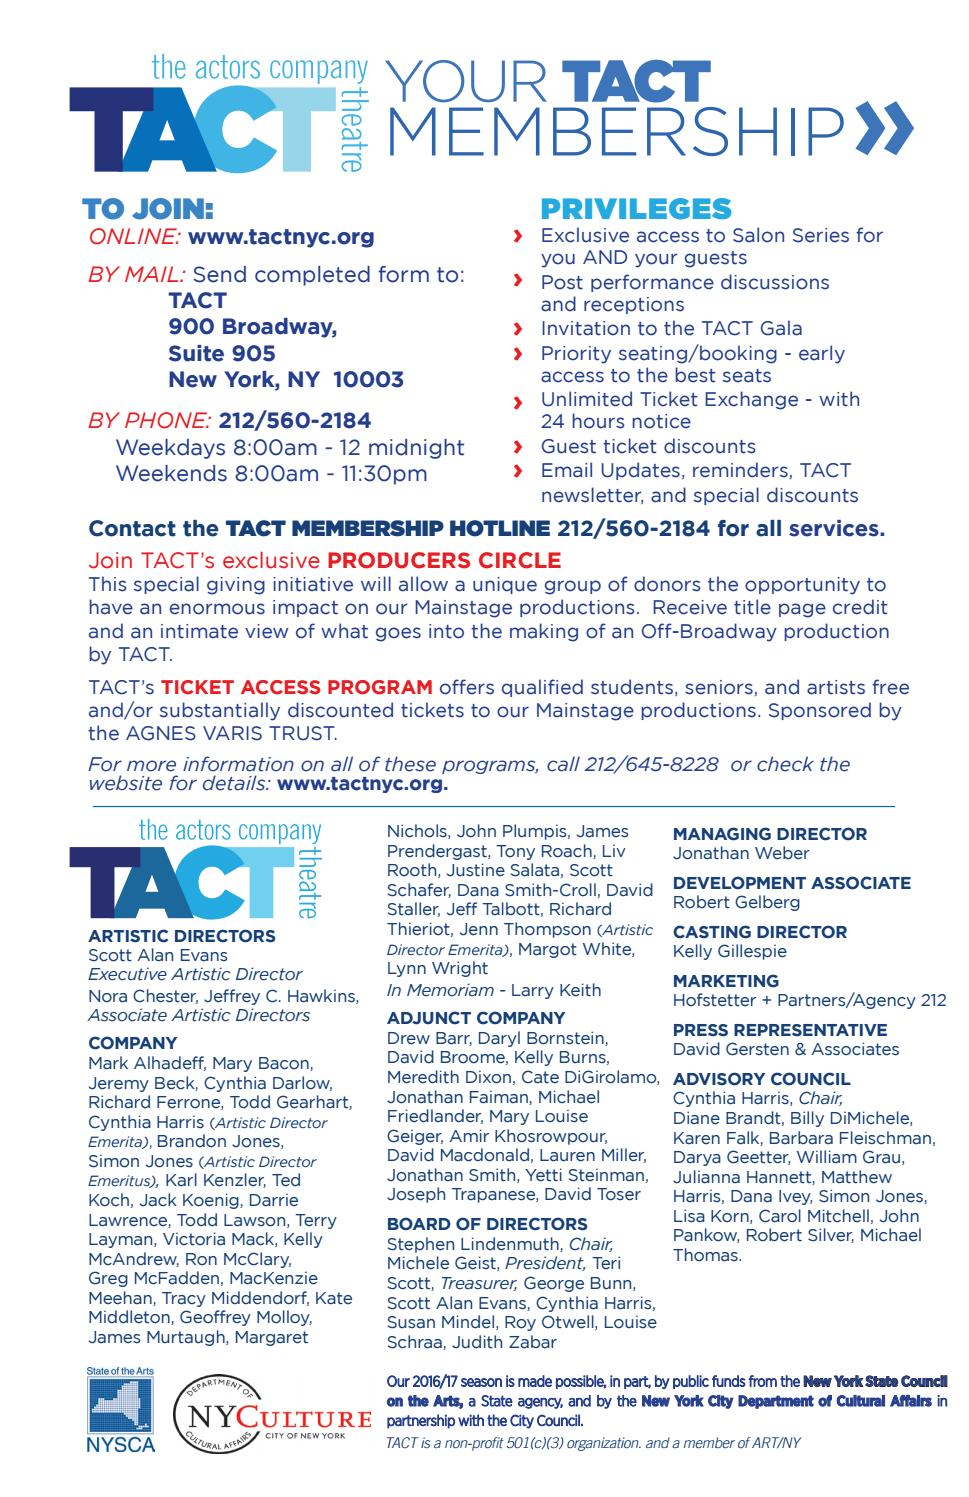 2016-17 TACT Season Brochure by TACT/The Actors Company